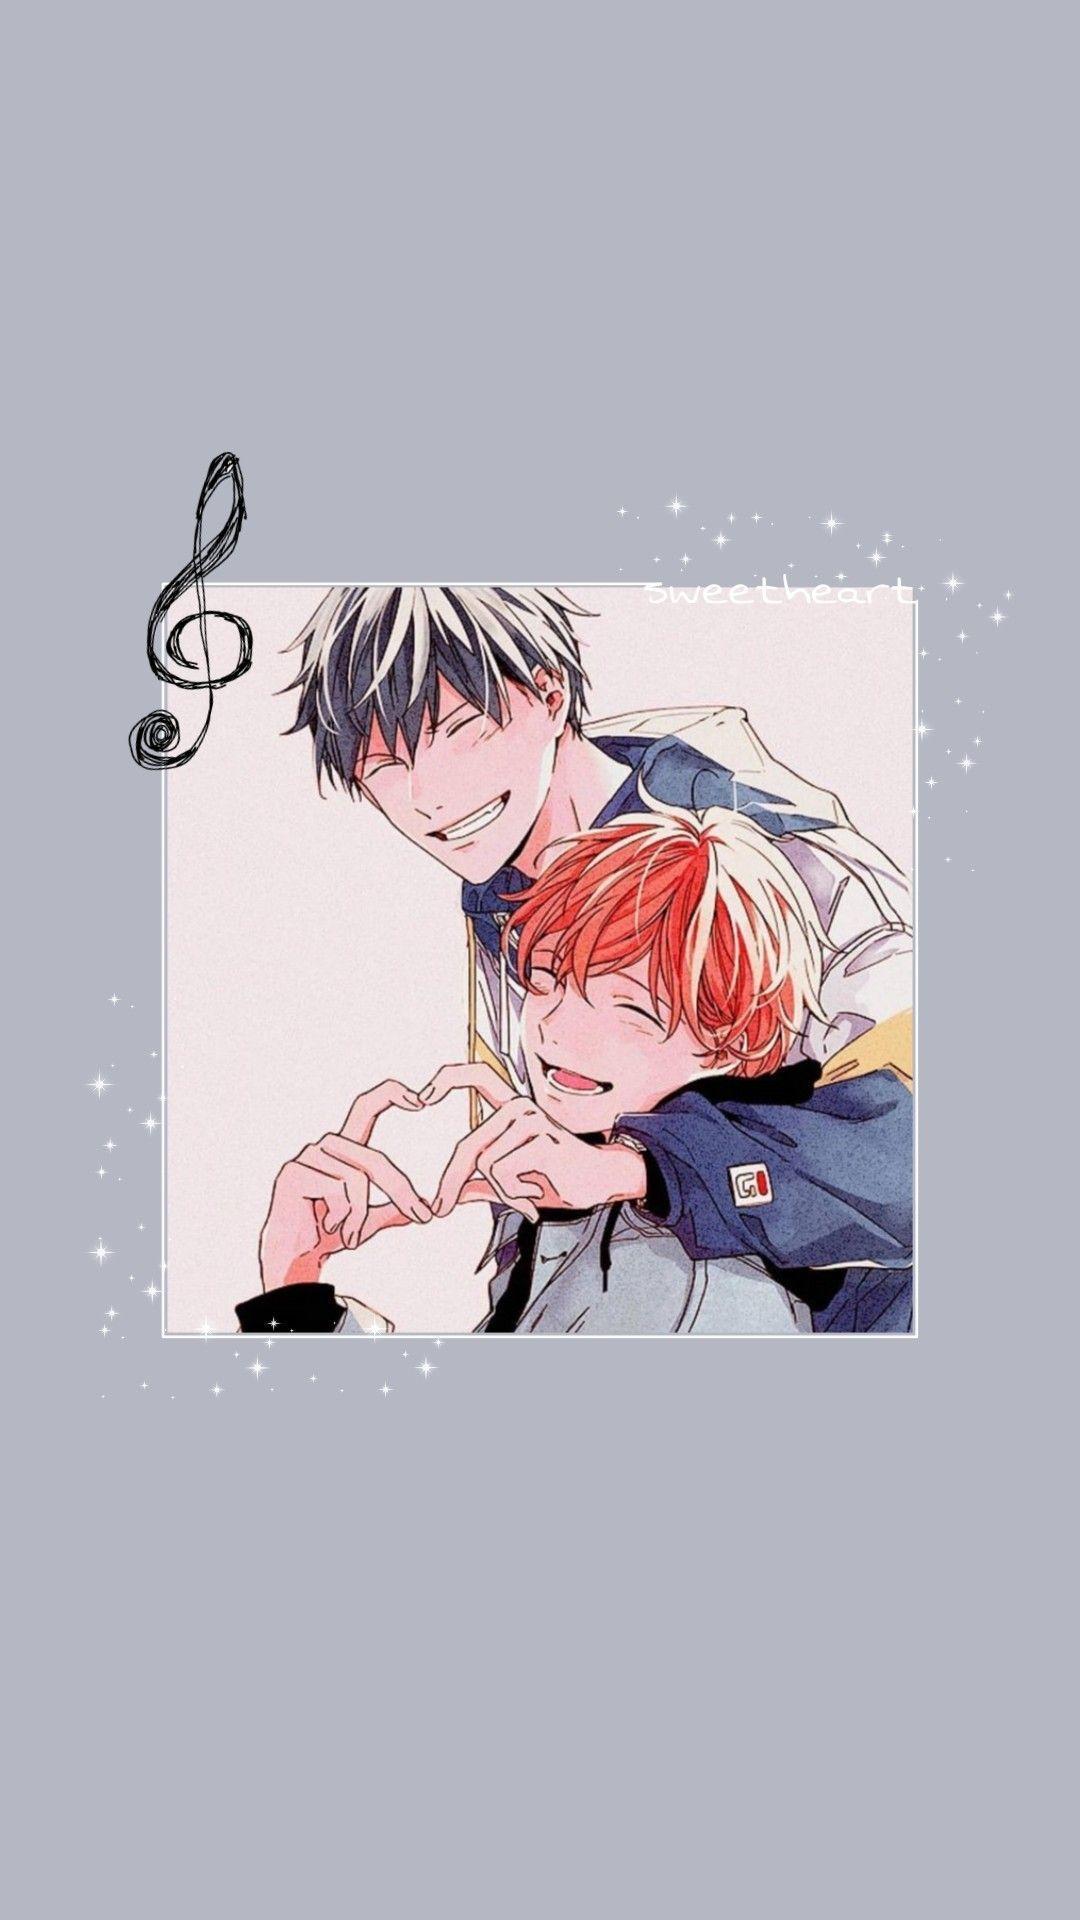 Given Mafuyu And Uenoyama Cute Anime Wallpaper Anime Wallpaper Phone Anime Wallpaper